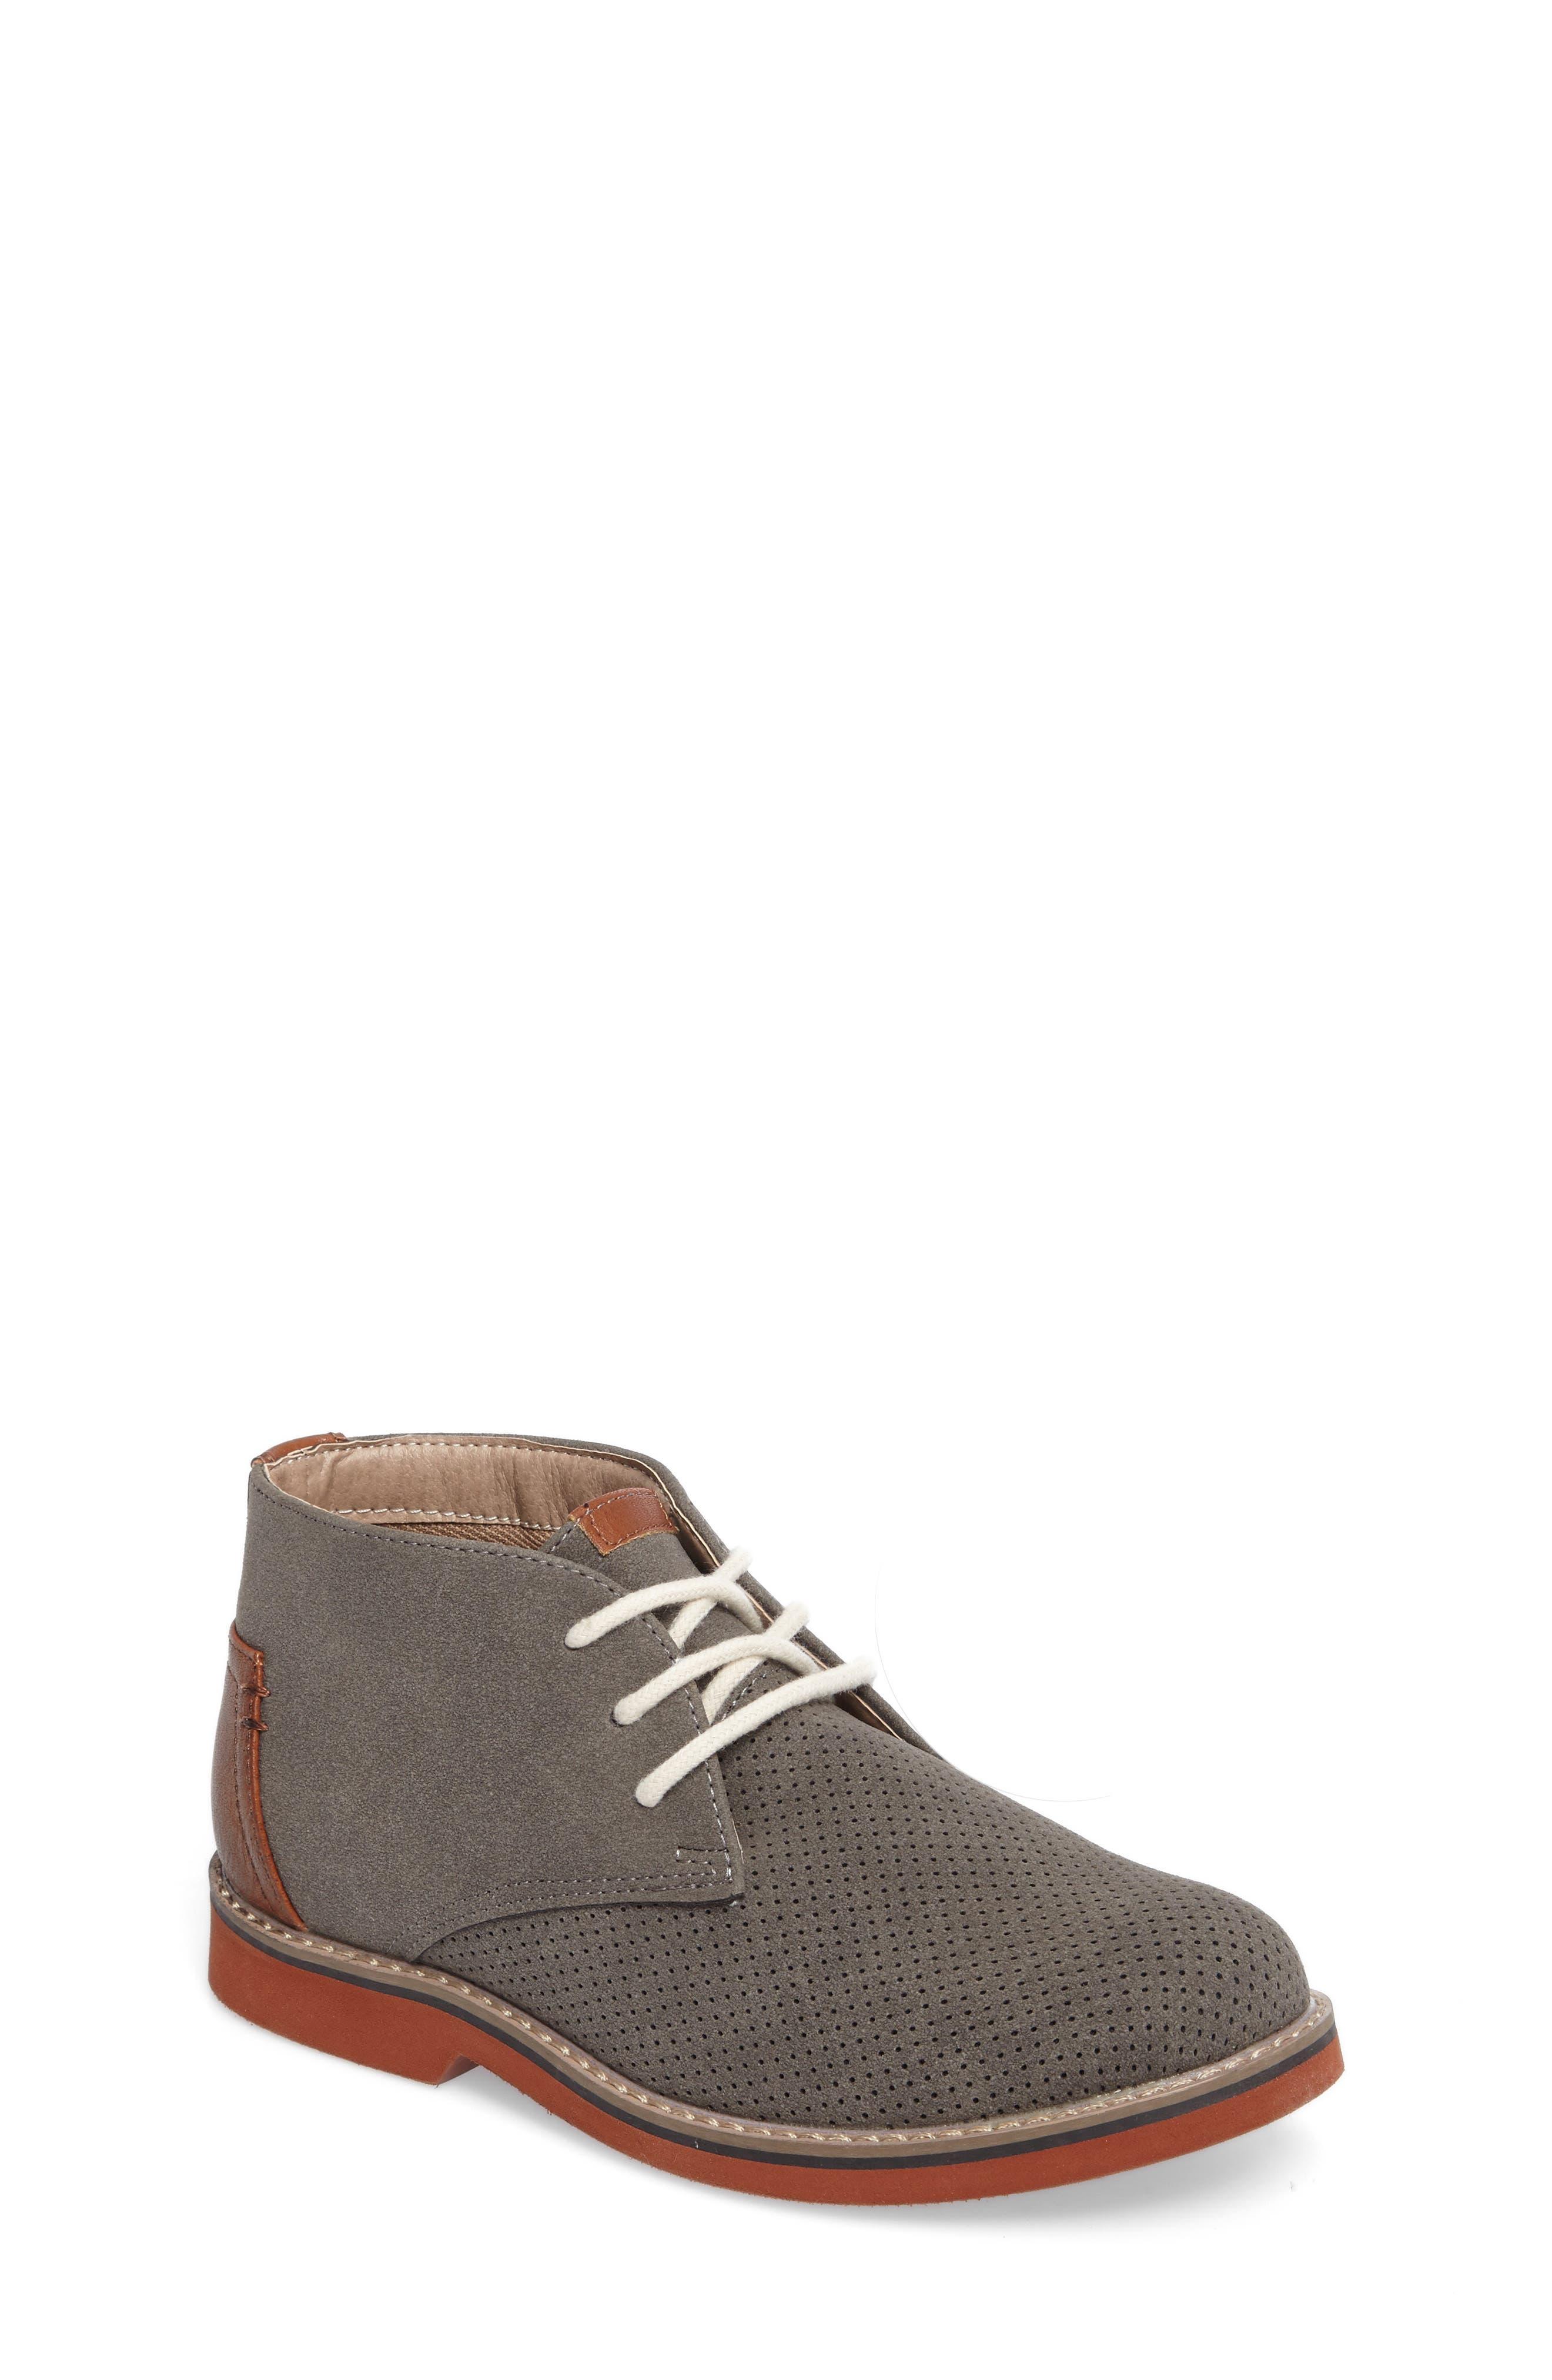 Baden Perforated Chukka Shoe,                         Main,                         color, 055